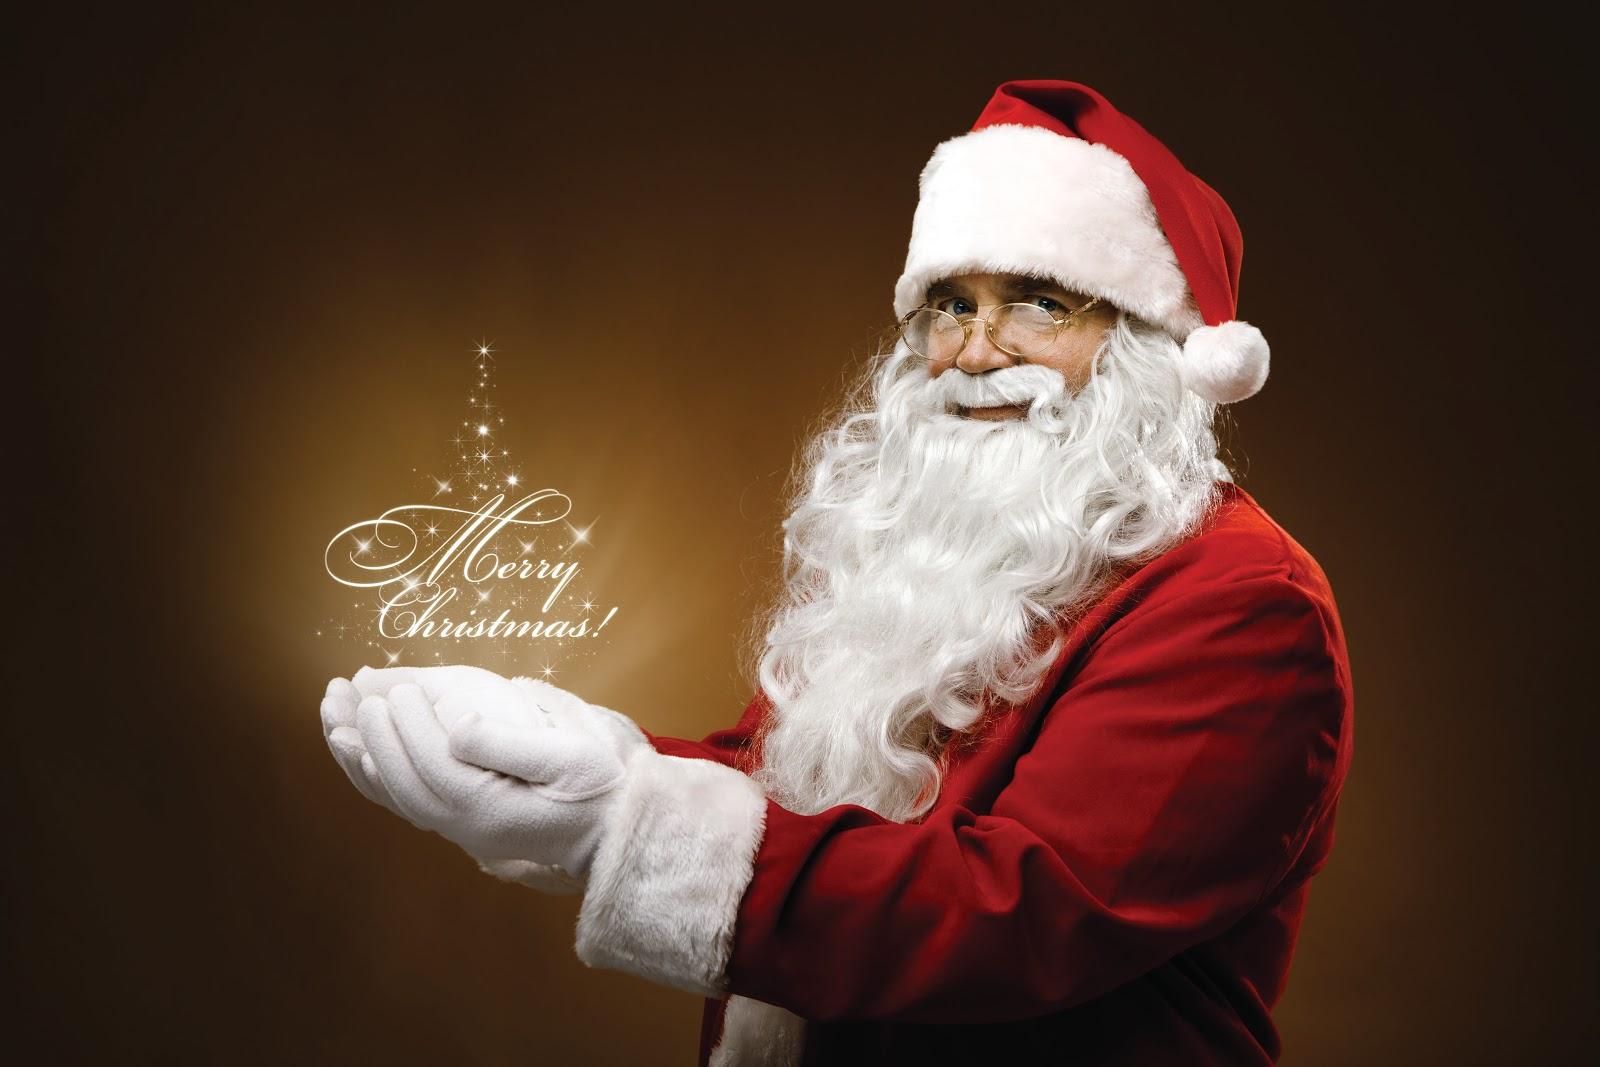 Christmas Santa Claus: Santa Claus Avatars